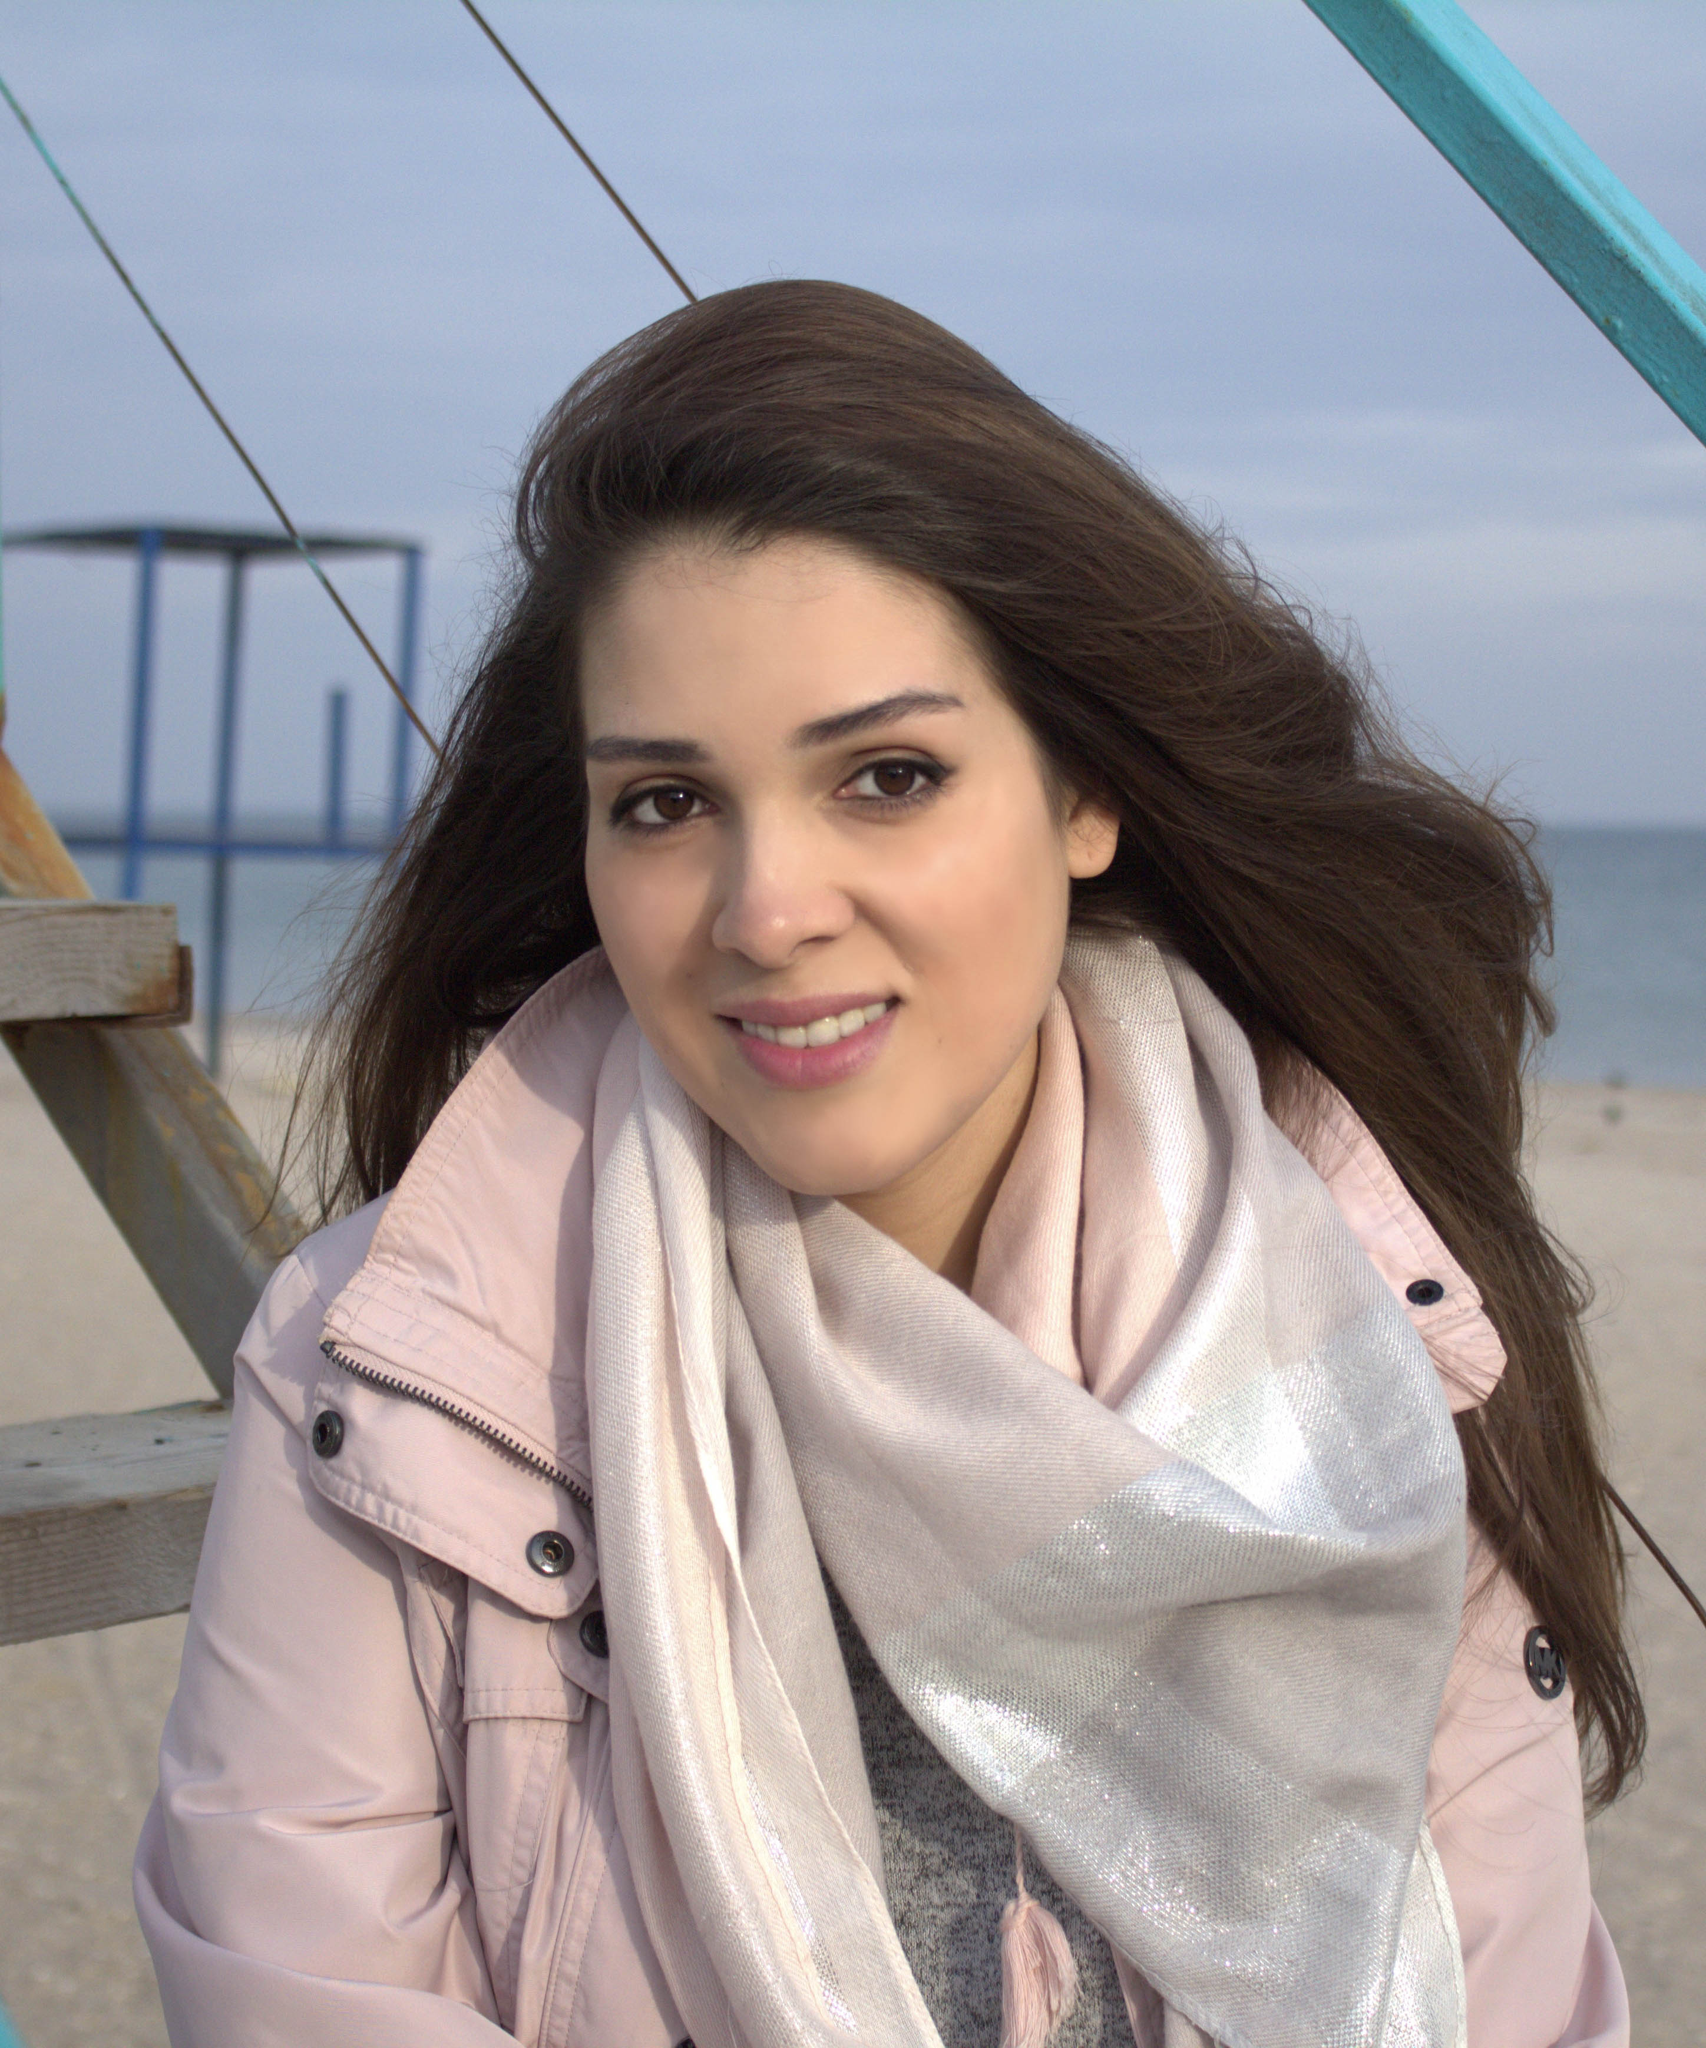 Дарина Кочанжи. Интервью